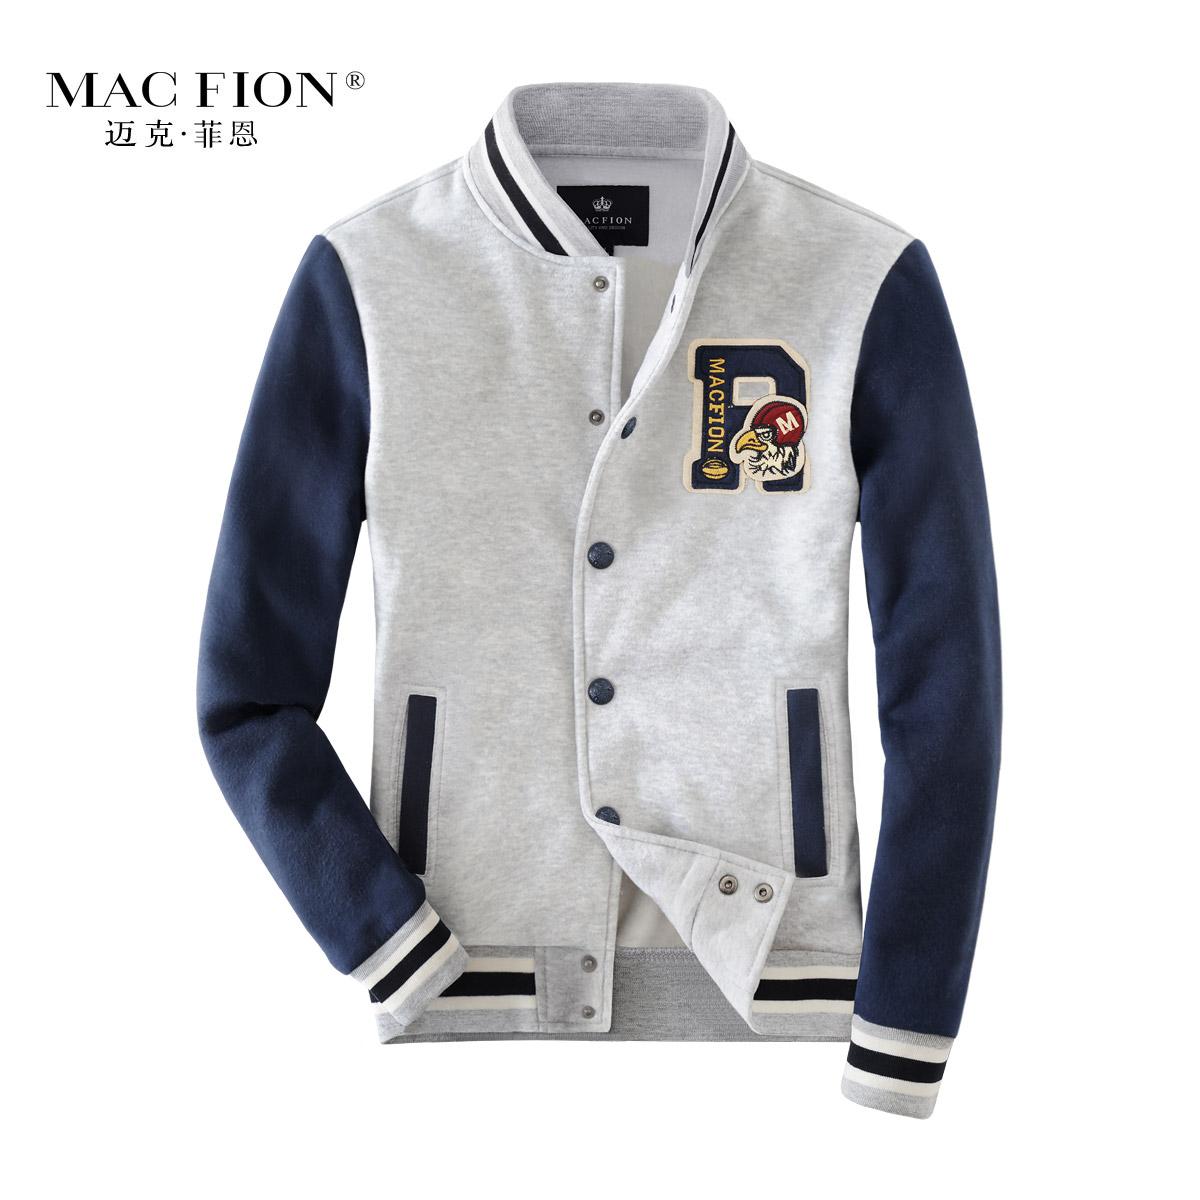 Macfion 邁克 middot 菲恩2016 男士撞色立領衛衣男外套